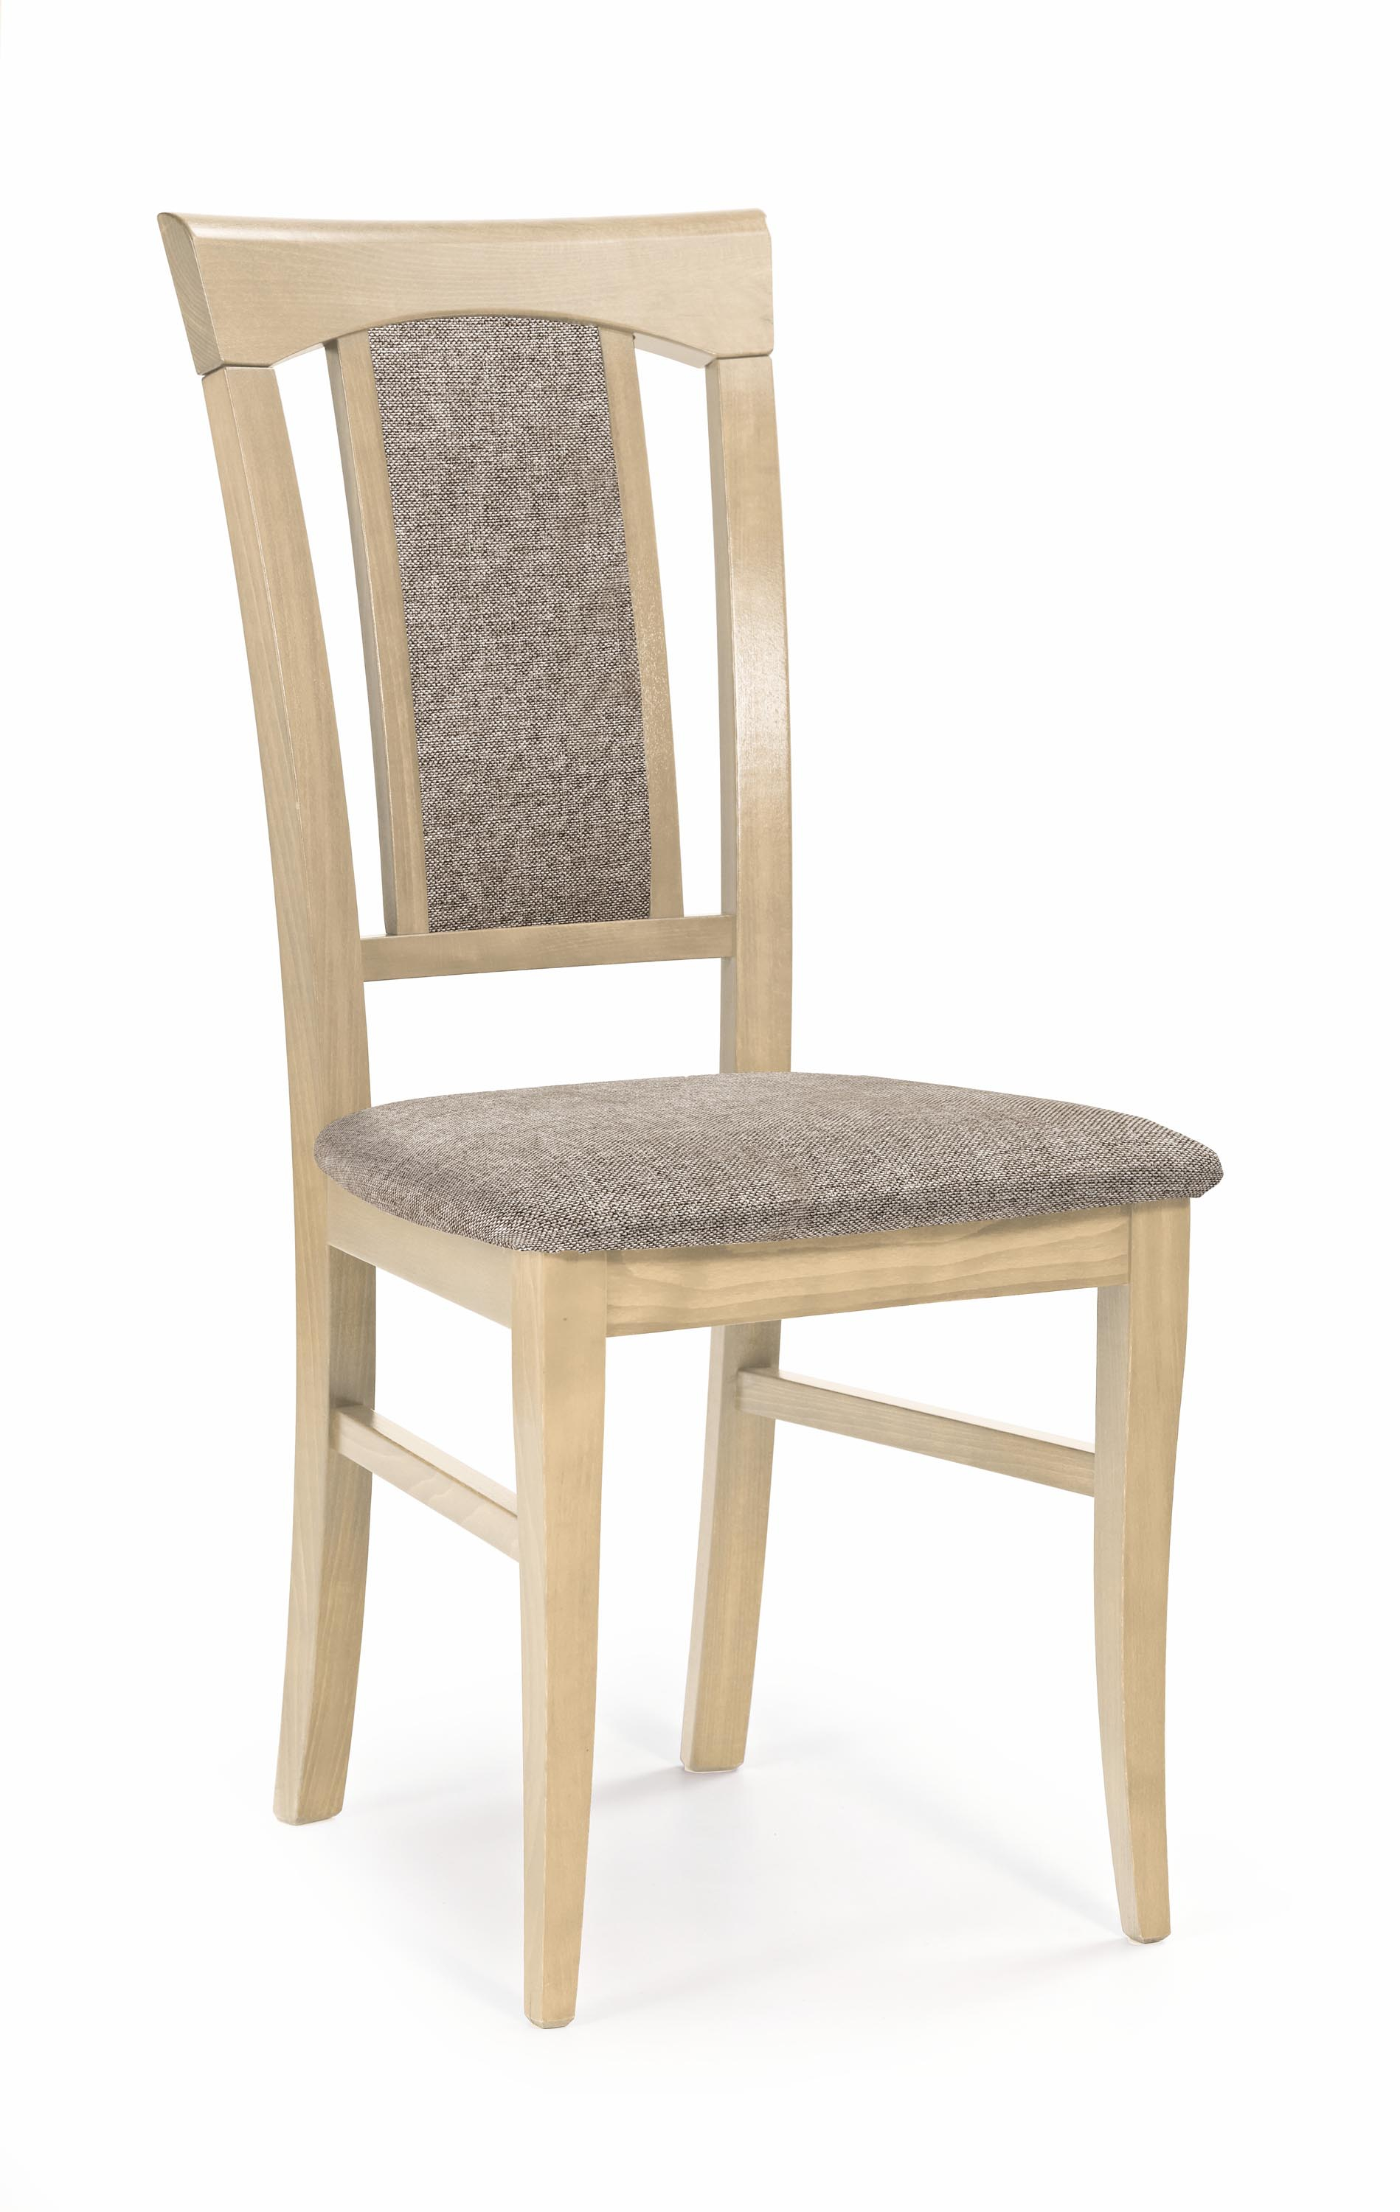 KONRAD krzesło dąb sonoma / tap: Inari 23 (1p=2szt)